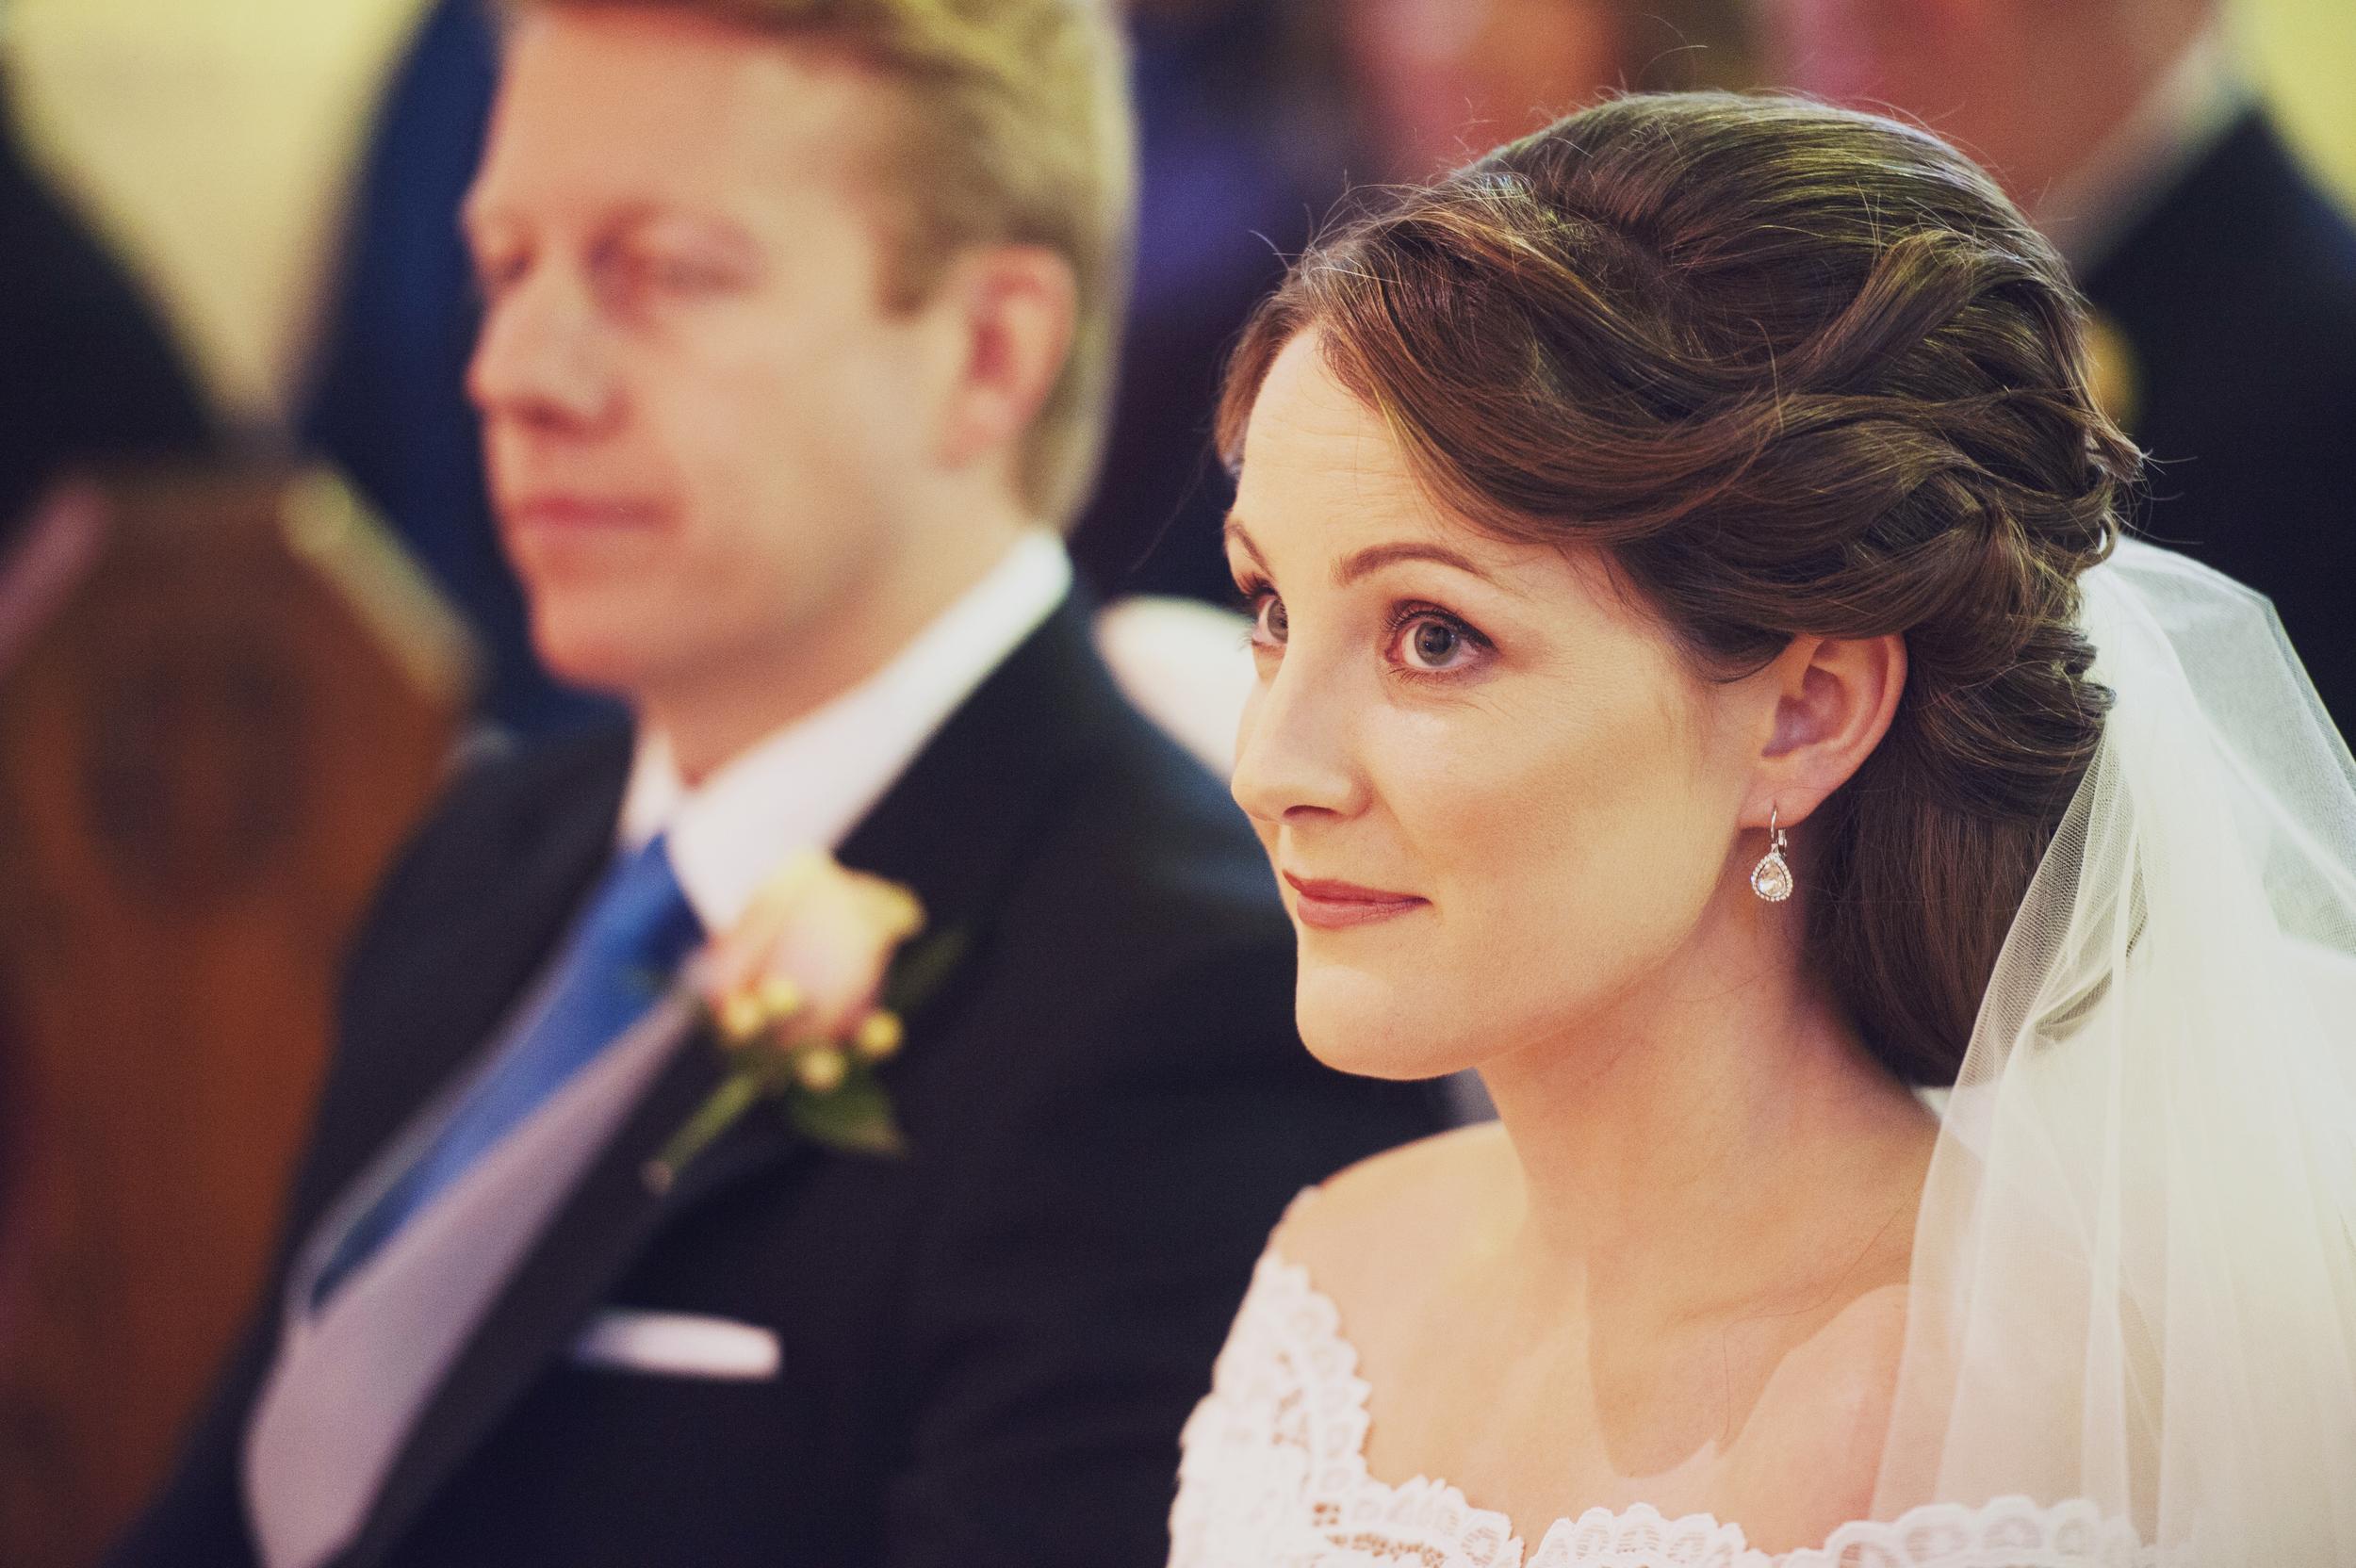 Carton_House_Wedding_Photography_Maynooth_Ireland_045.jpg